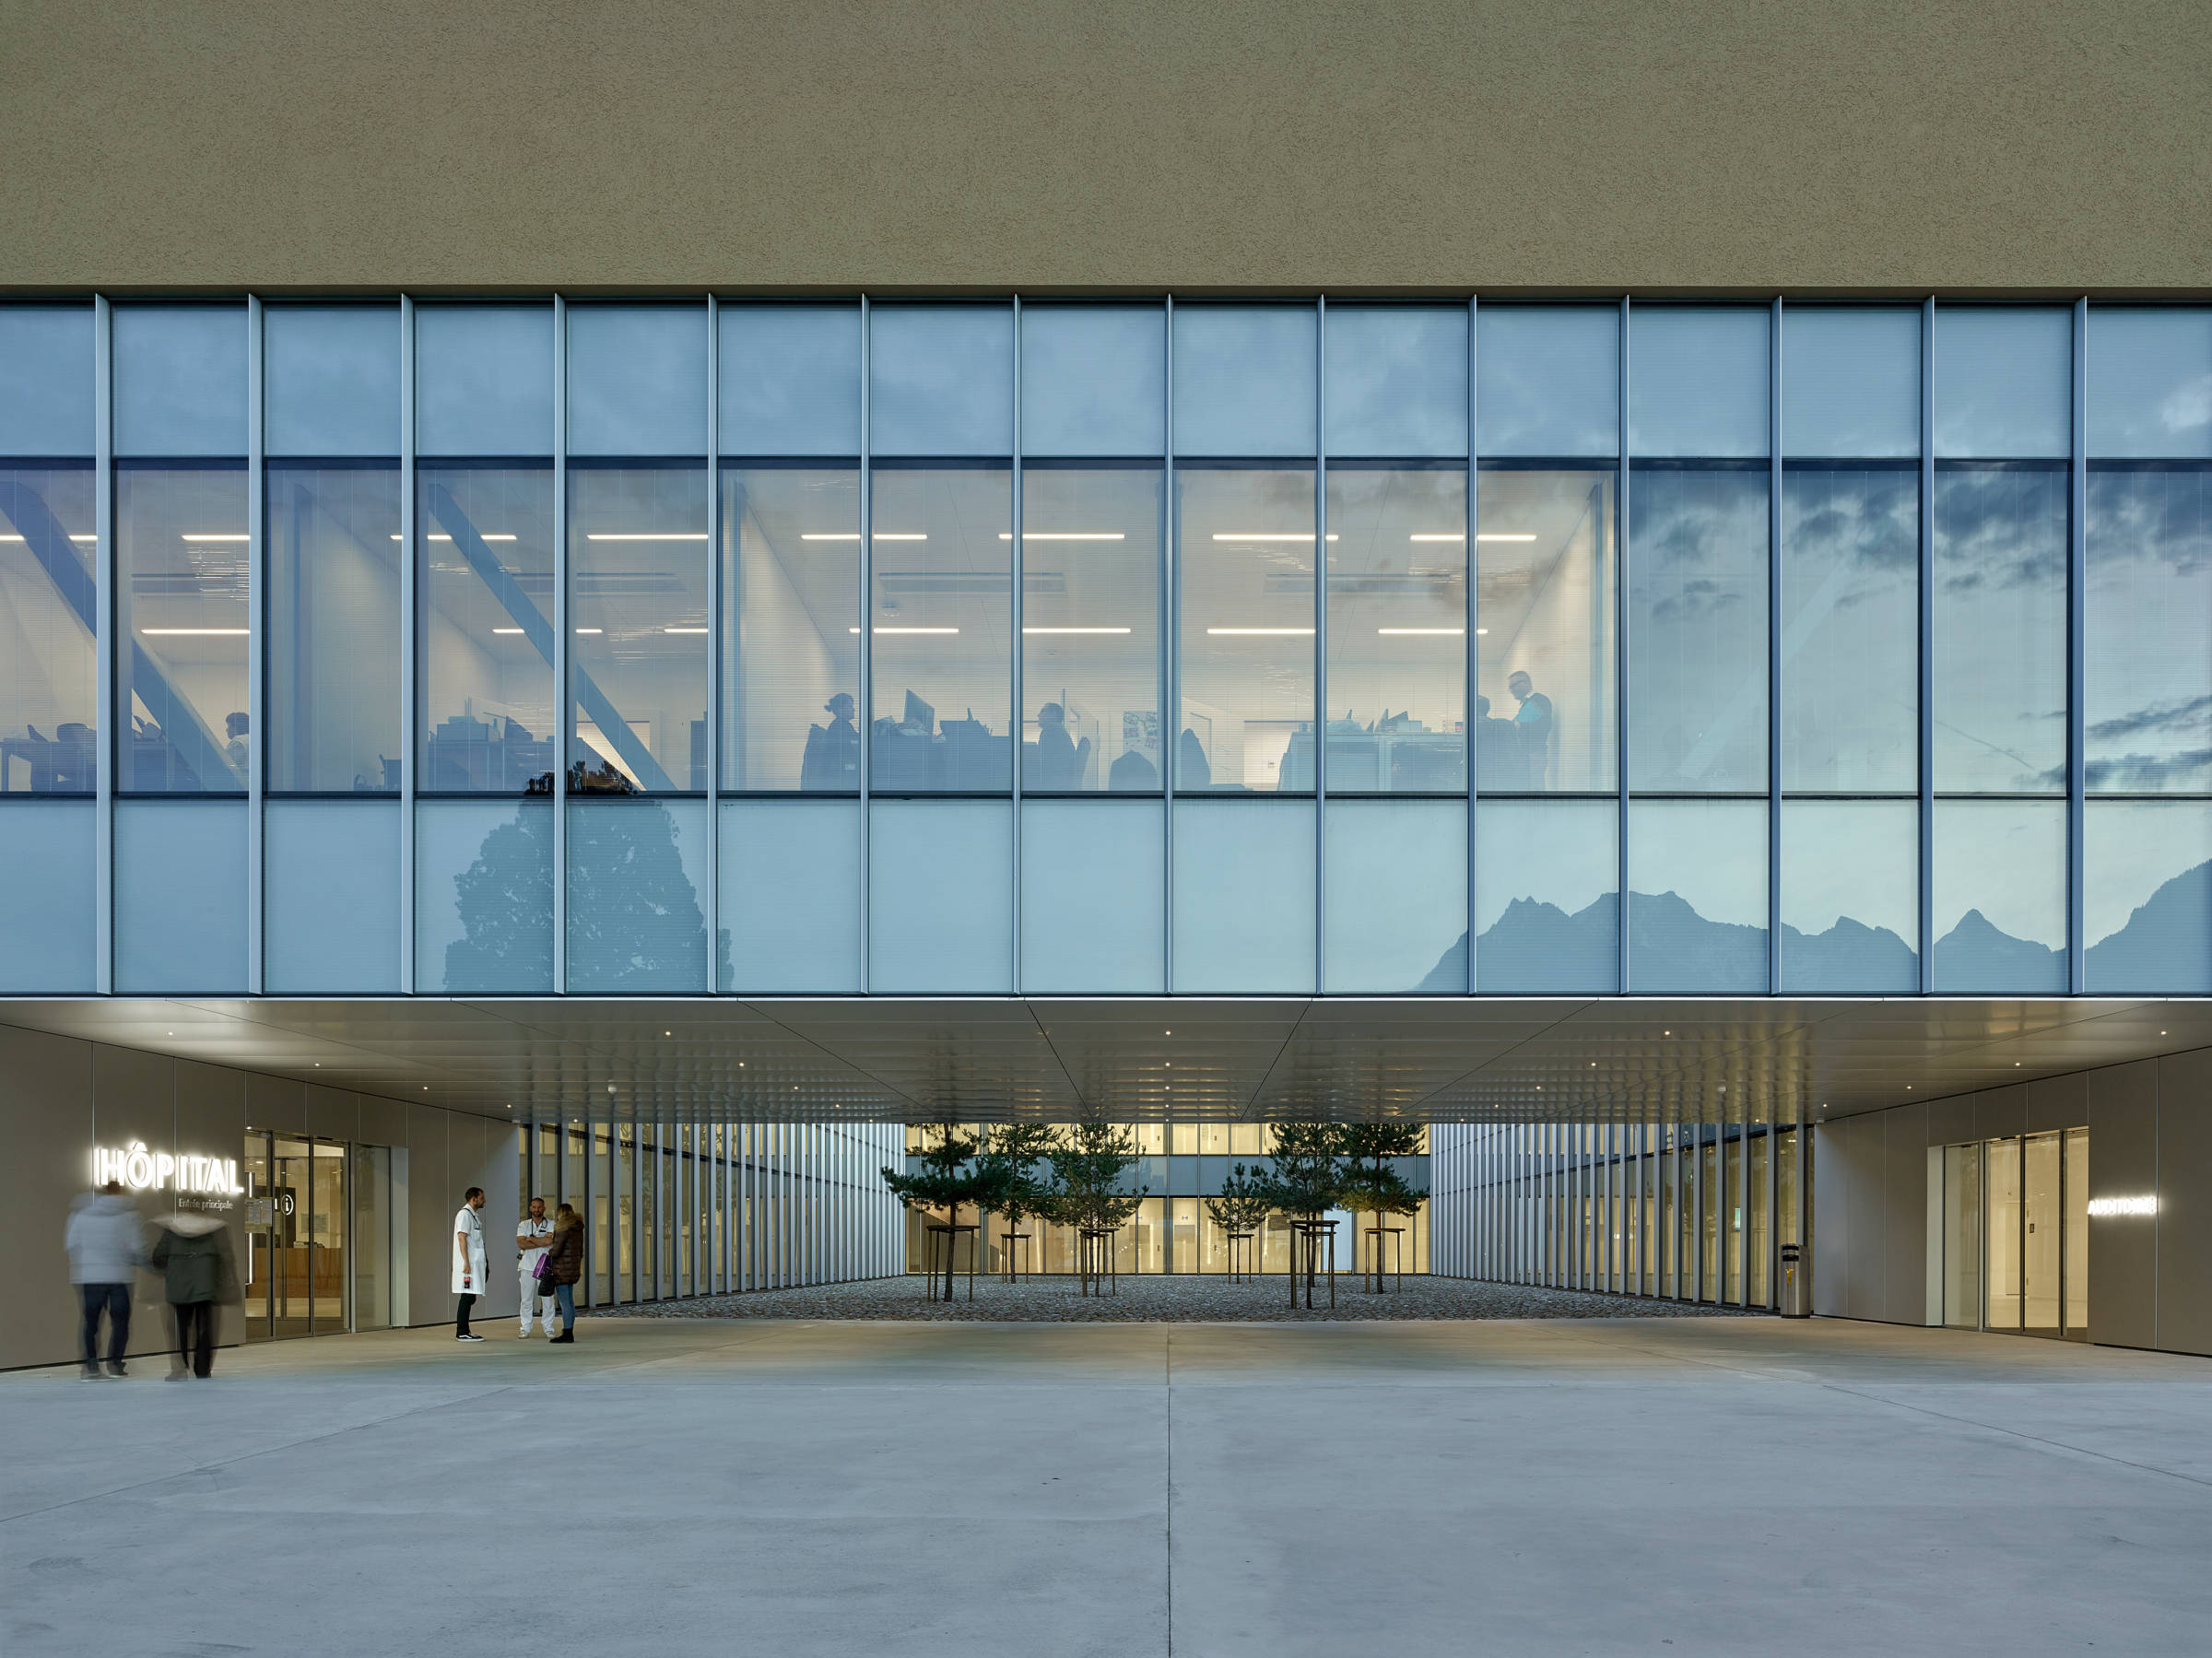 Architecture d'Hôpital - Hôpital Riviera-Chablais